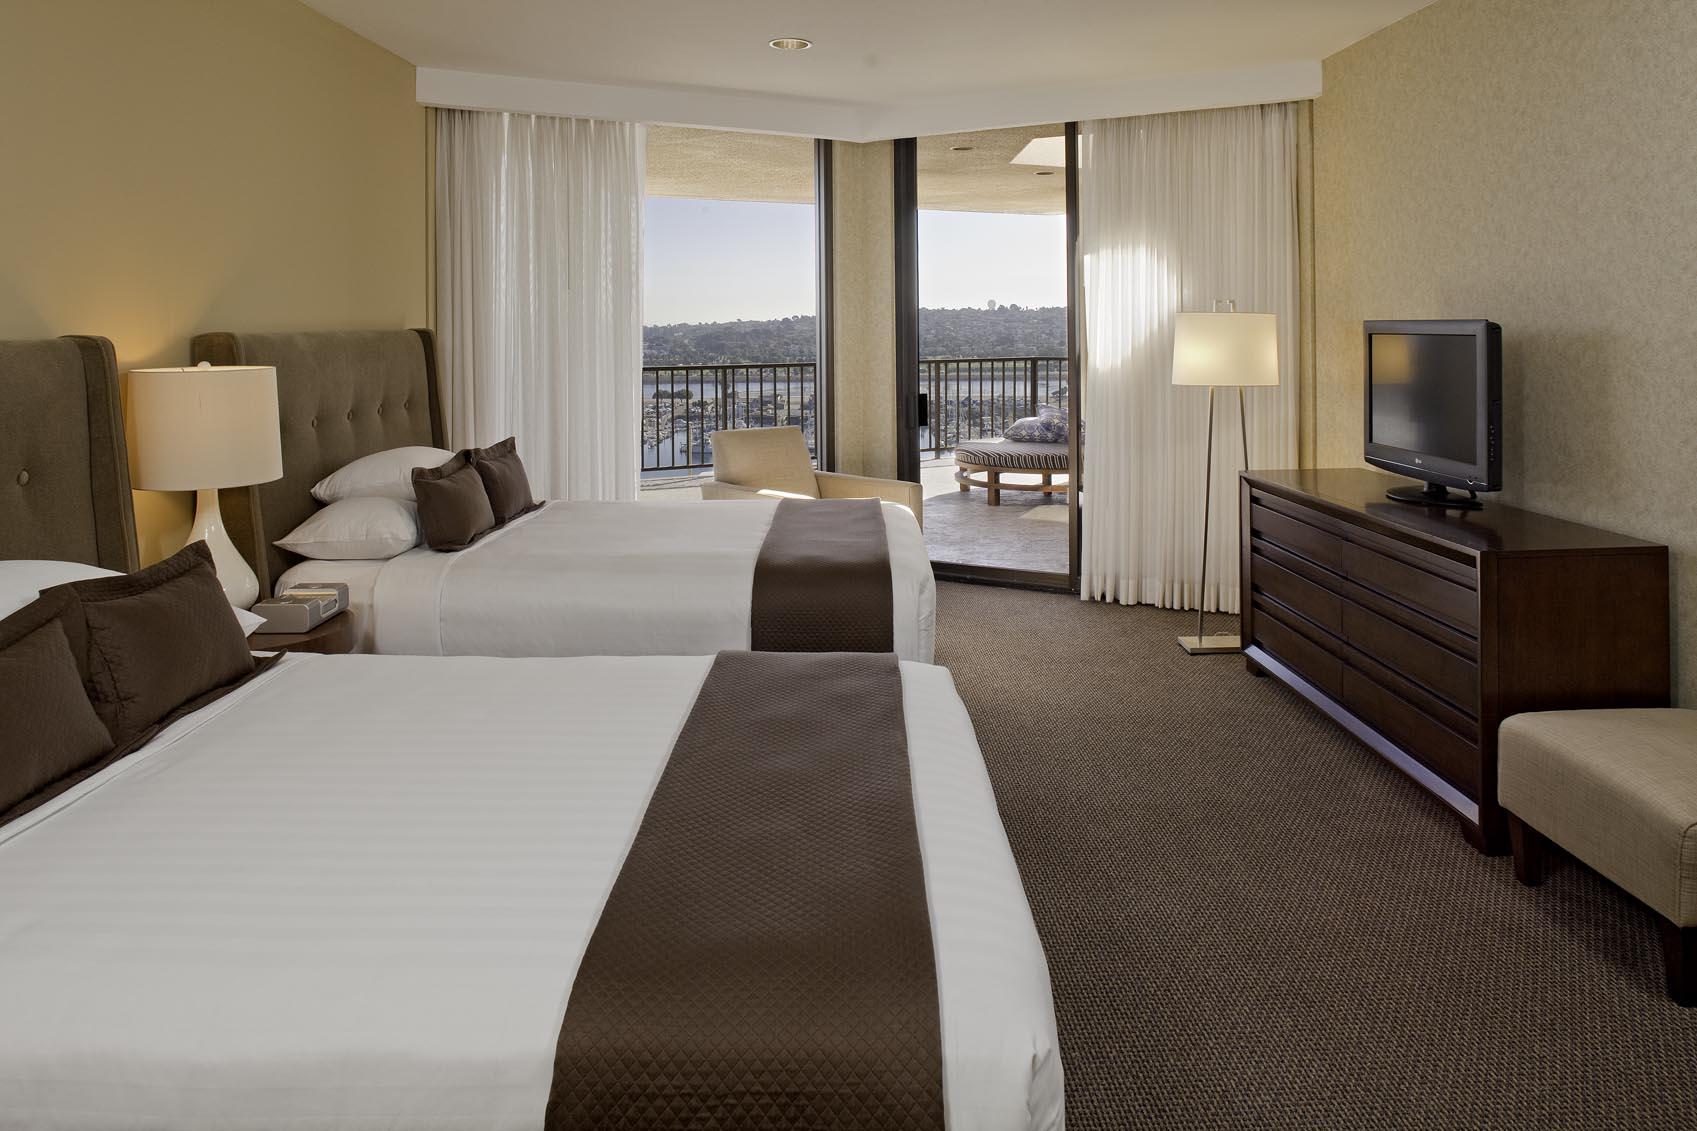 Exclusive presidential hotel suites in san diego - Hotels in san diego with 2 bedroom suites ...